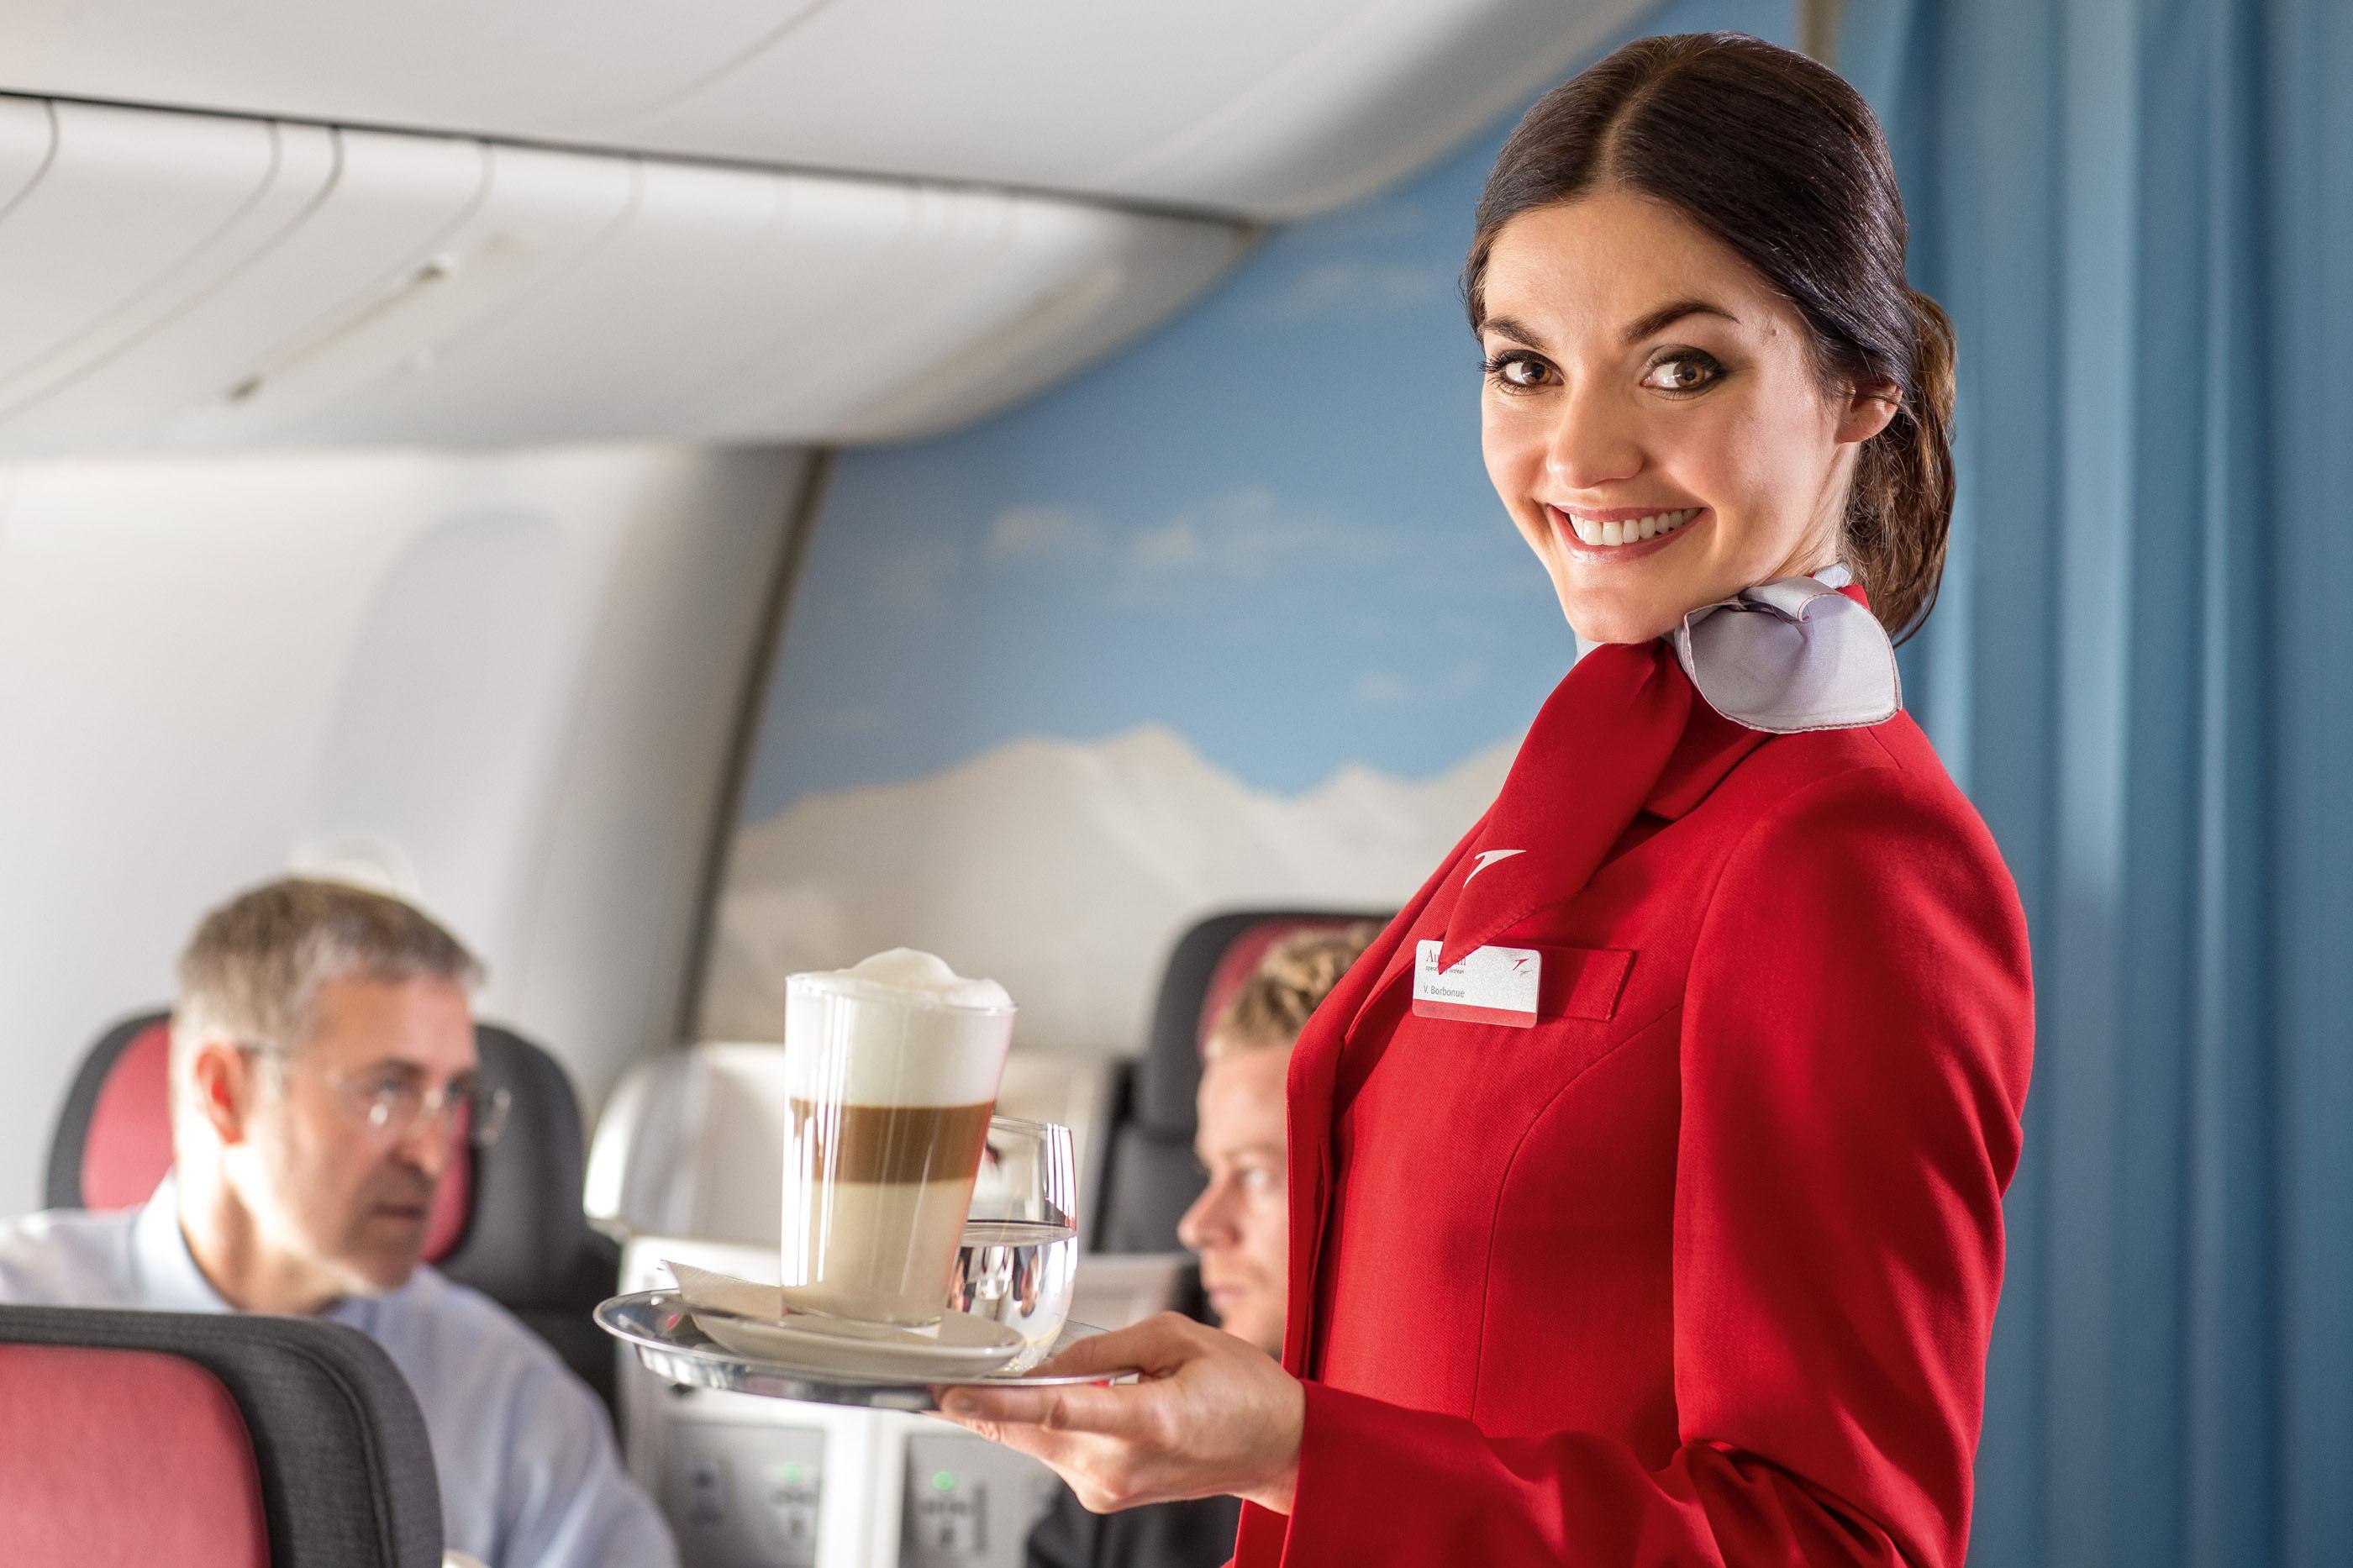 An_Austrian_Airlines_flight_attendant_serving_refreshments_to_passengers